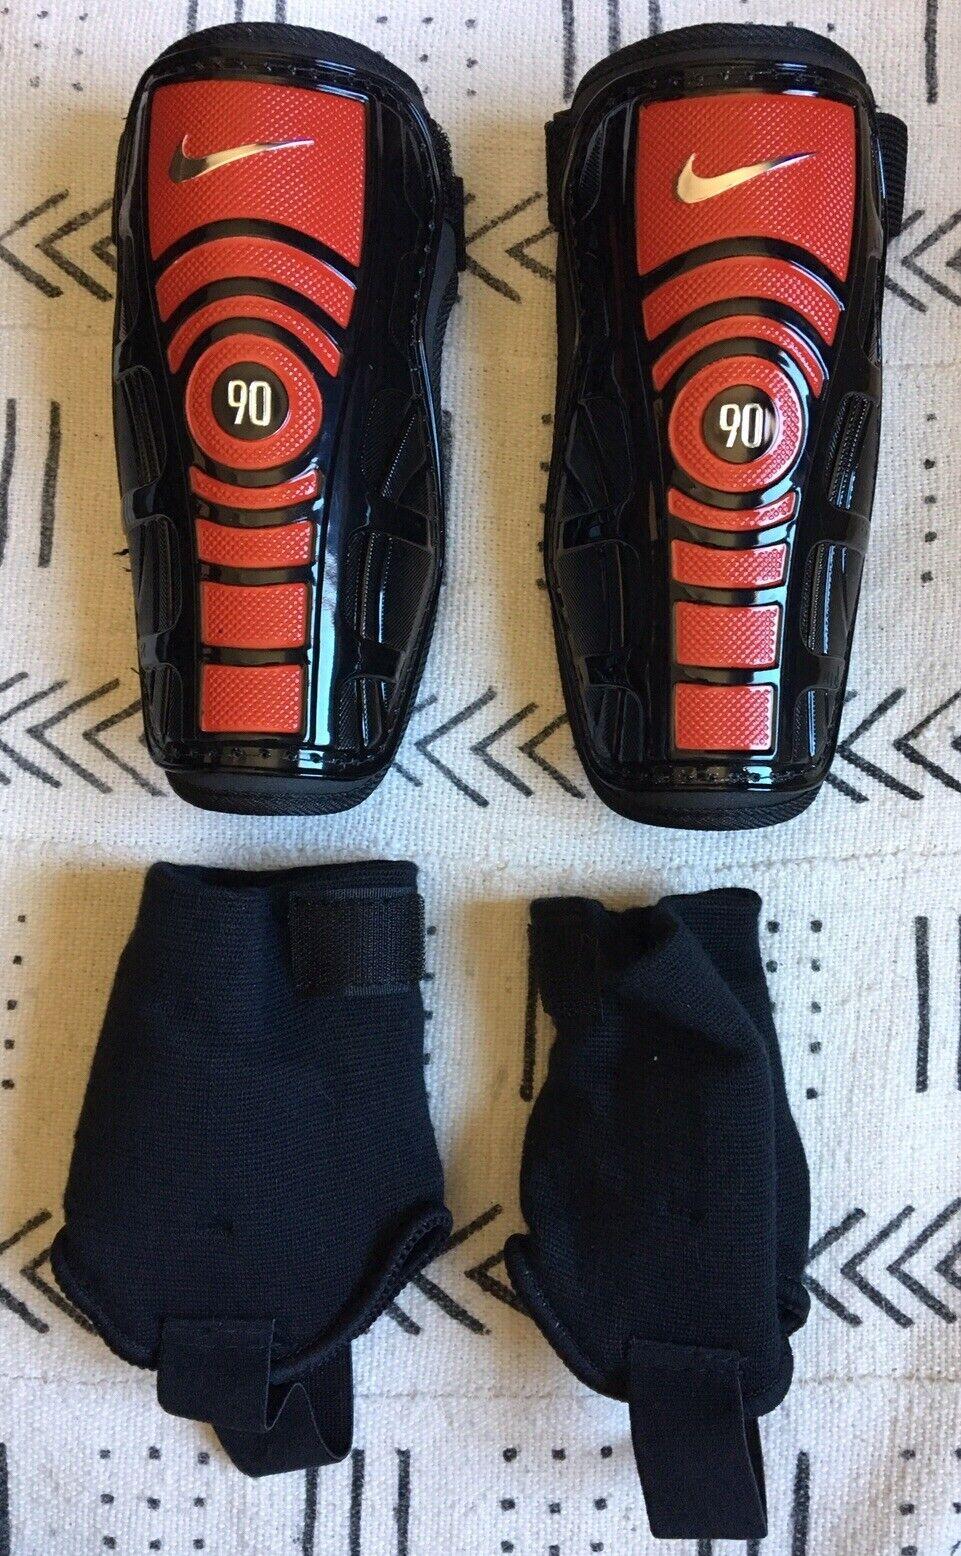 Extranjero isla cortina  Nike T90 Protegga Shield II Soccer Shin Guards - Size L for sale online |  eBay